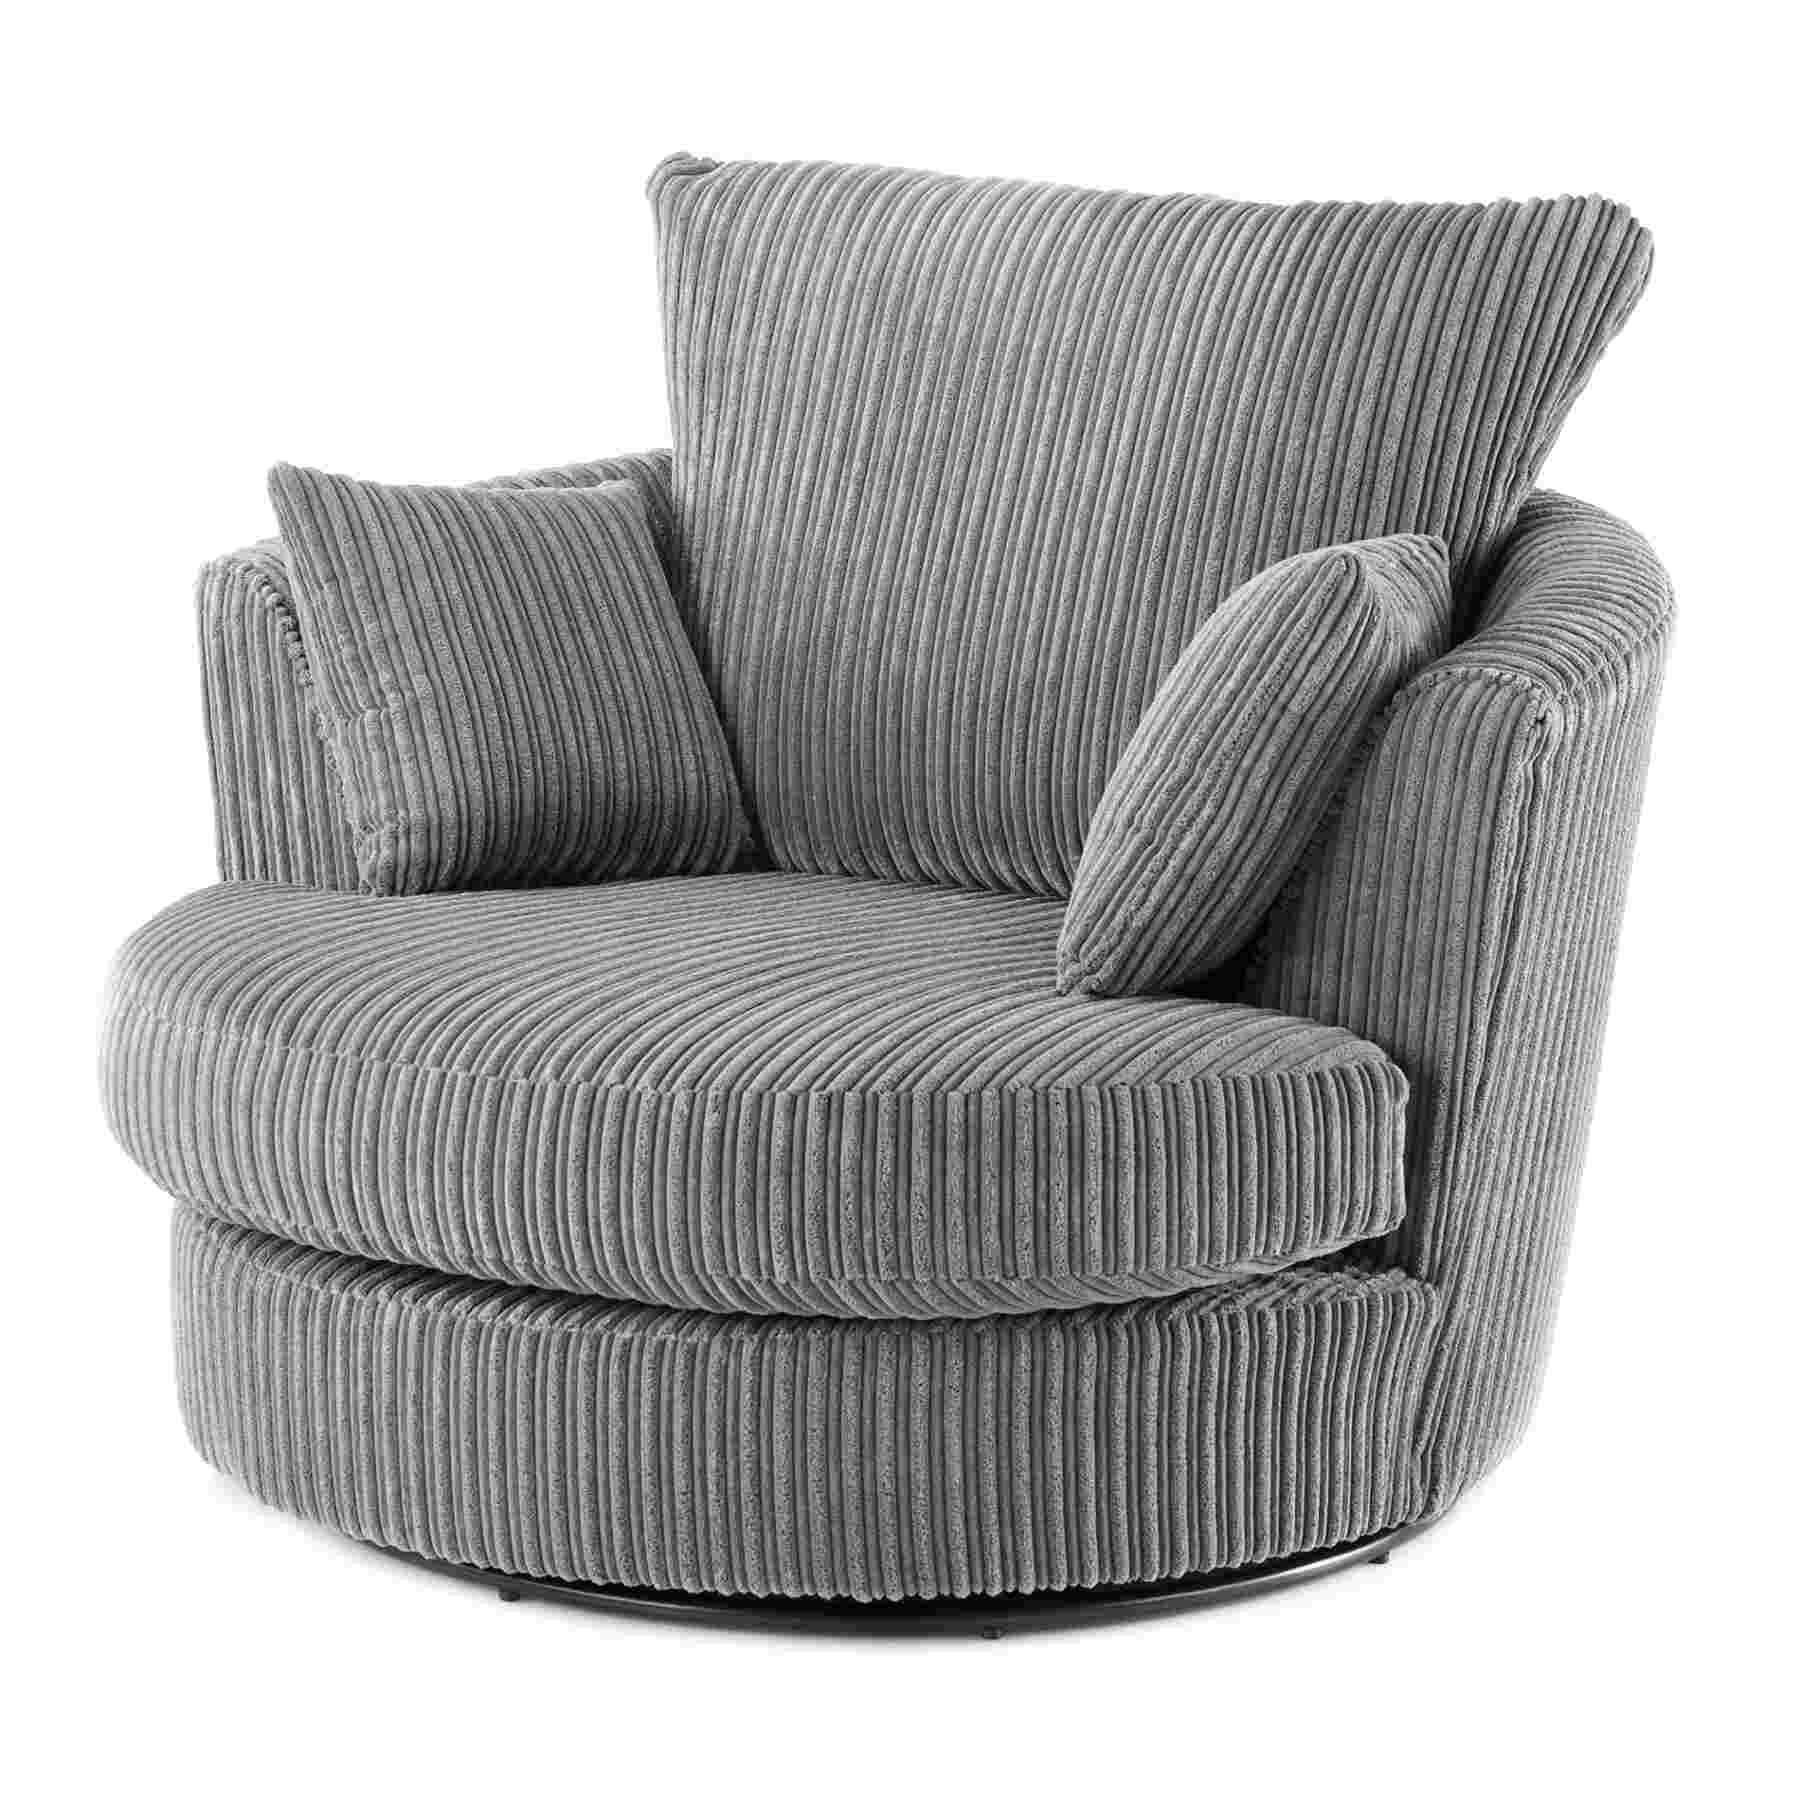 jumbo cord chairs for sale